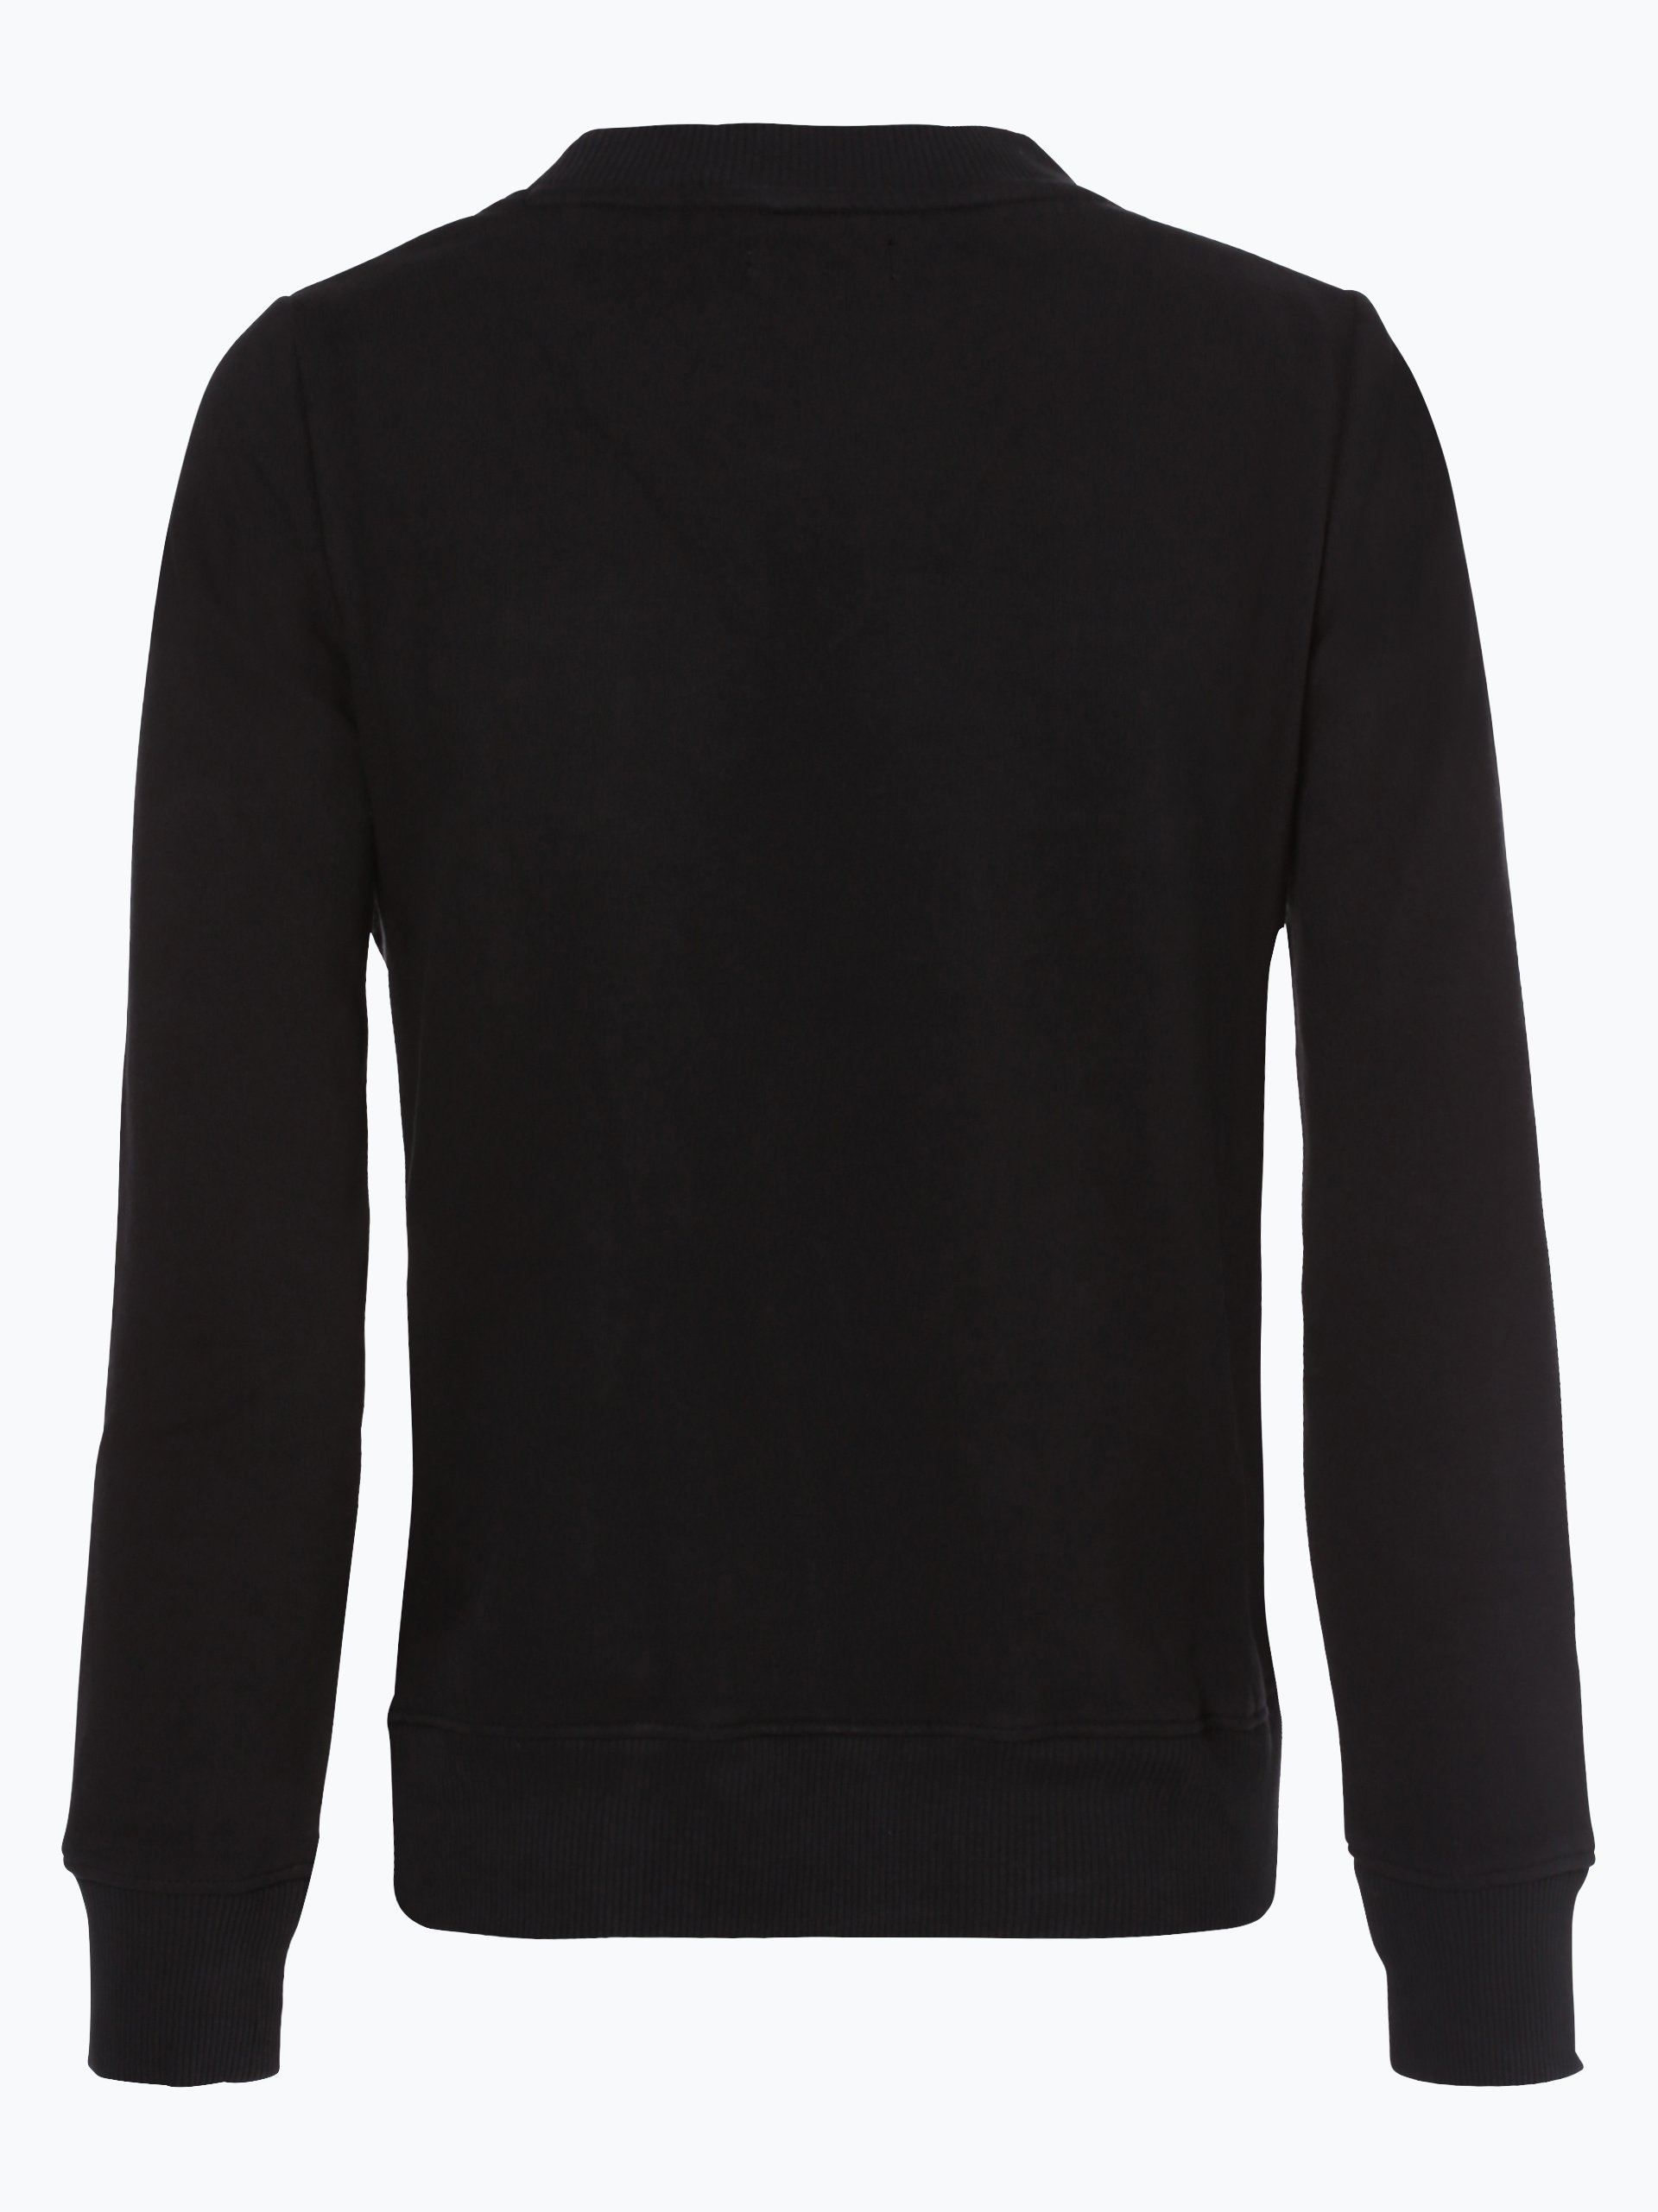 calvin klein jeans damen sweatshirt schwarz uni online. Black Bedroom Furniture Sets. Home Design Ideas